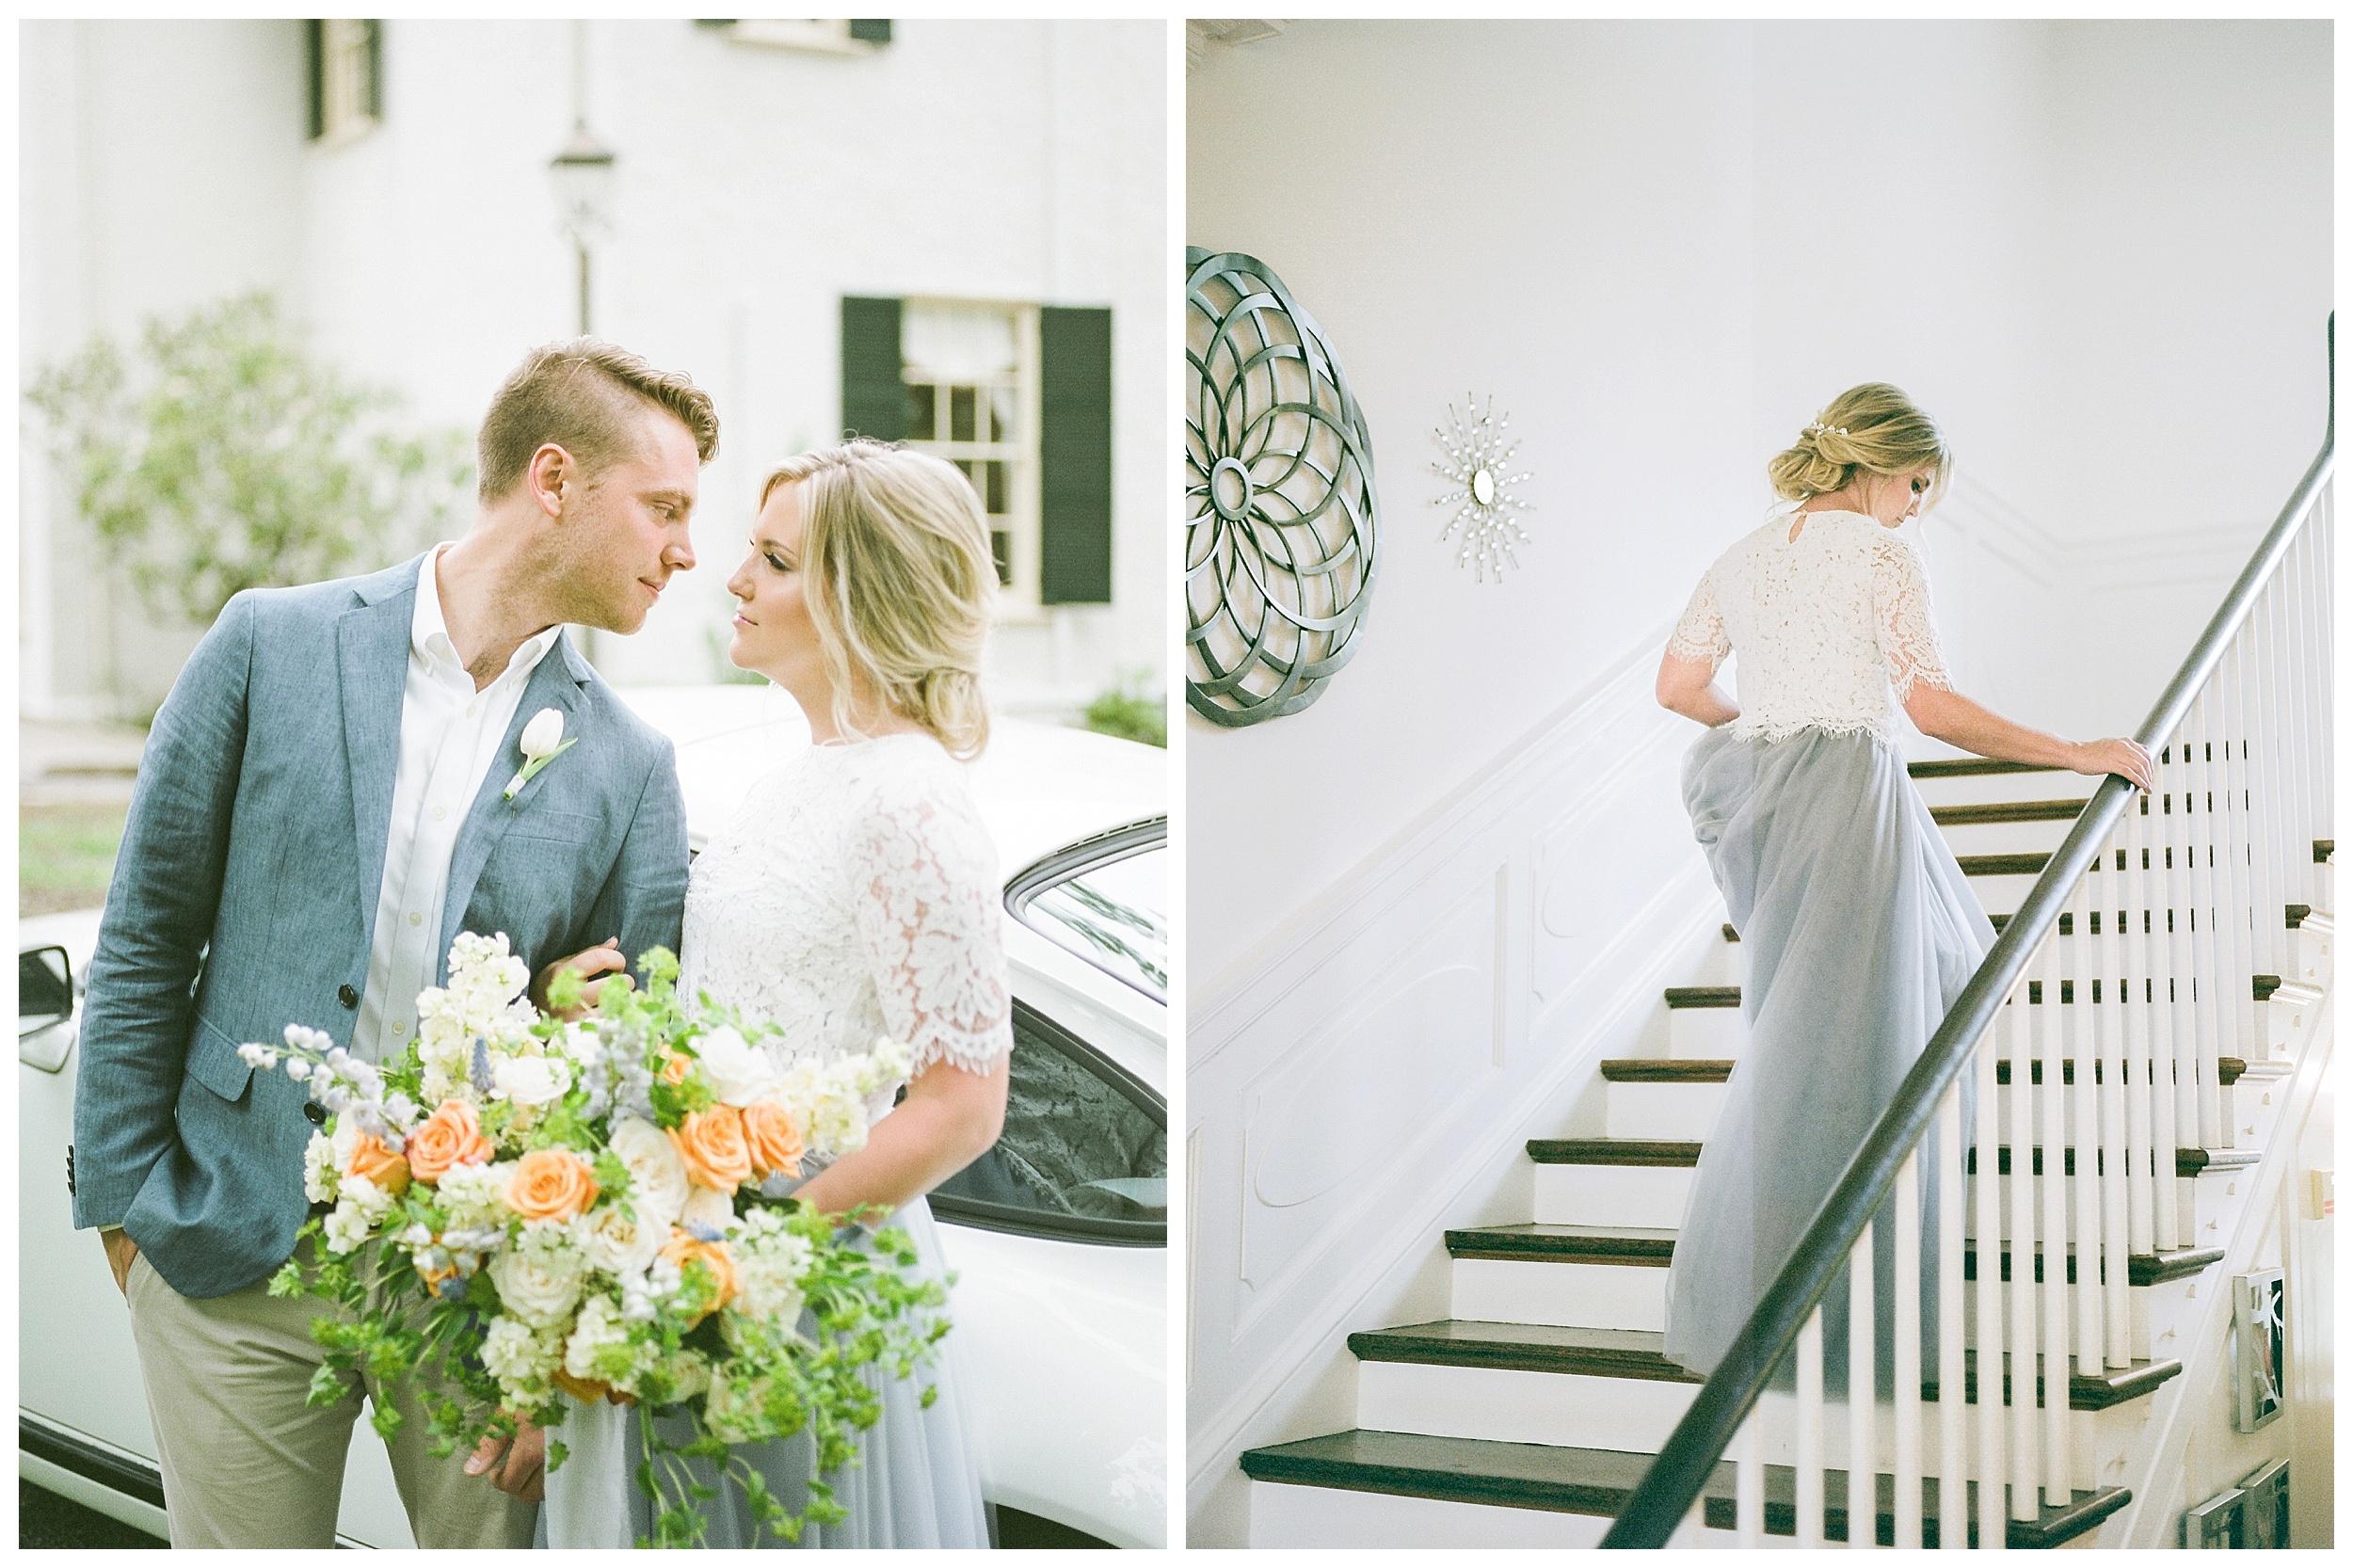 Rust Manor Wedding   Virginia Wedding Photographer Kir Tuben_0018.jpg